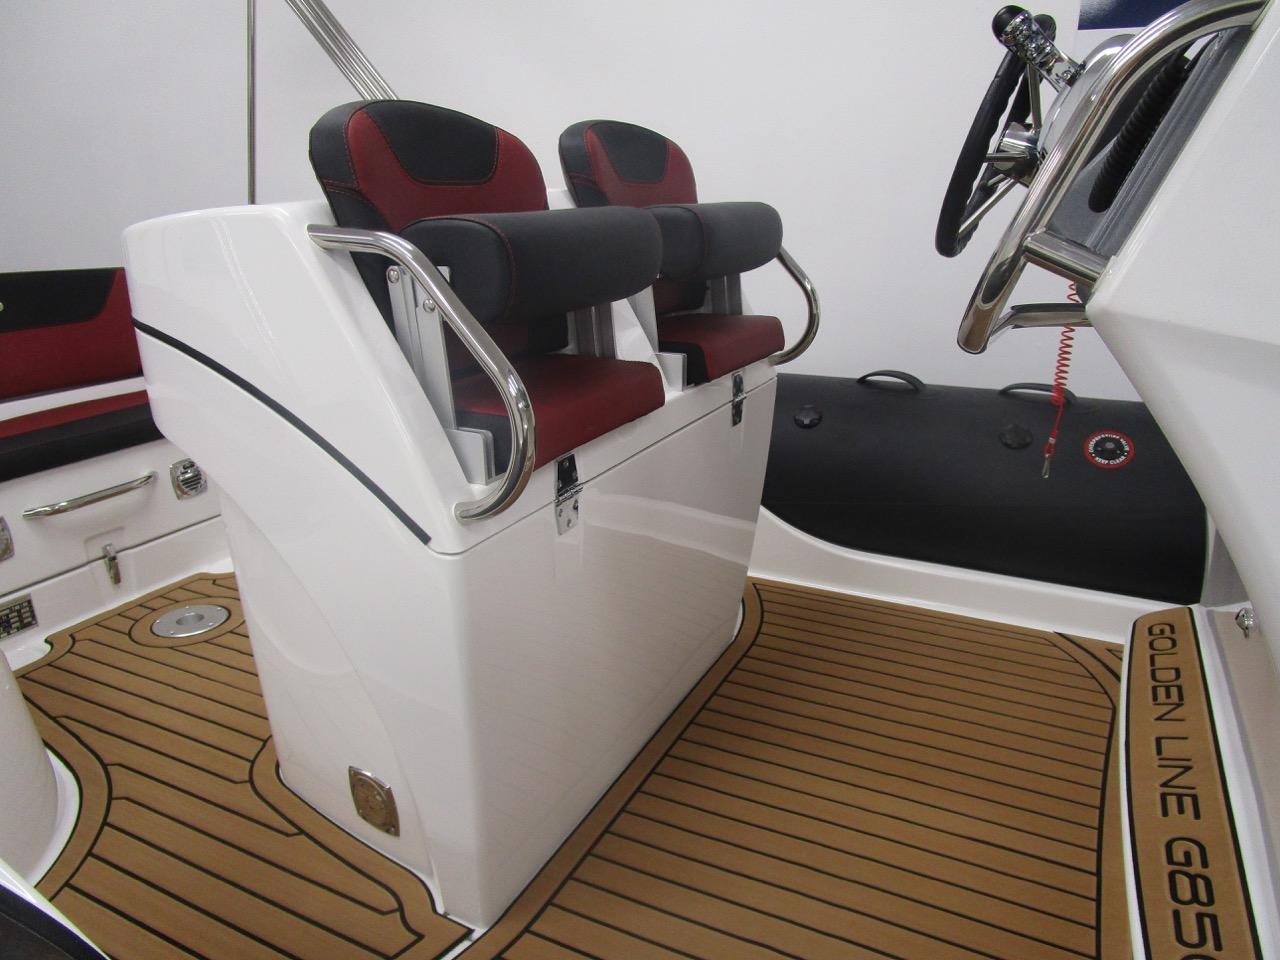 GRAND G850 RIB helm seats up